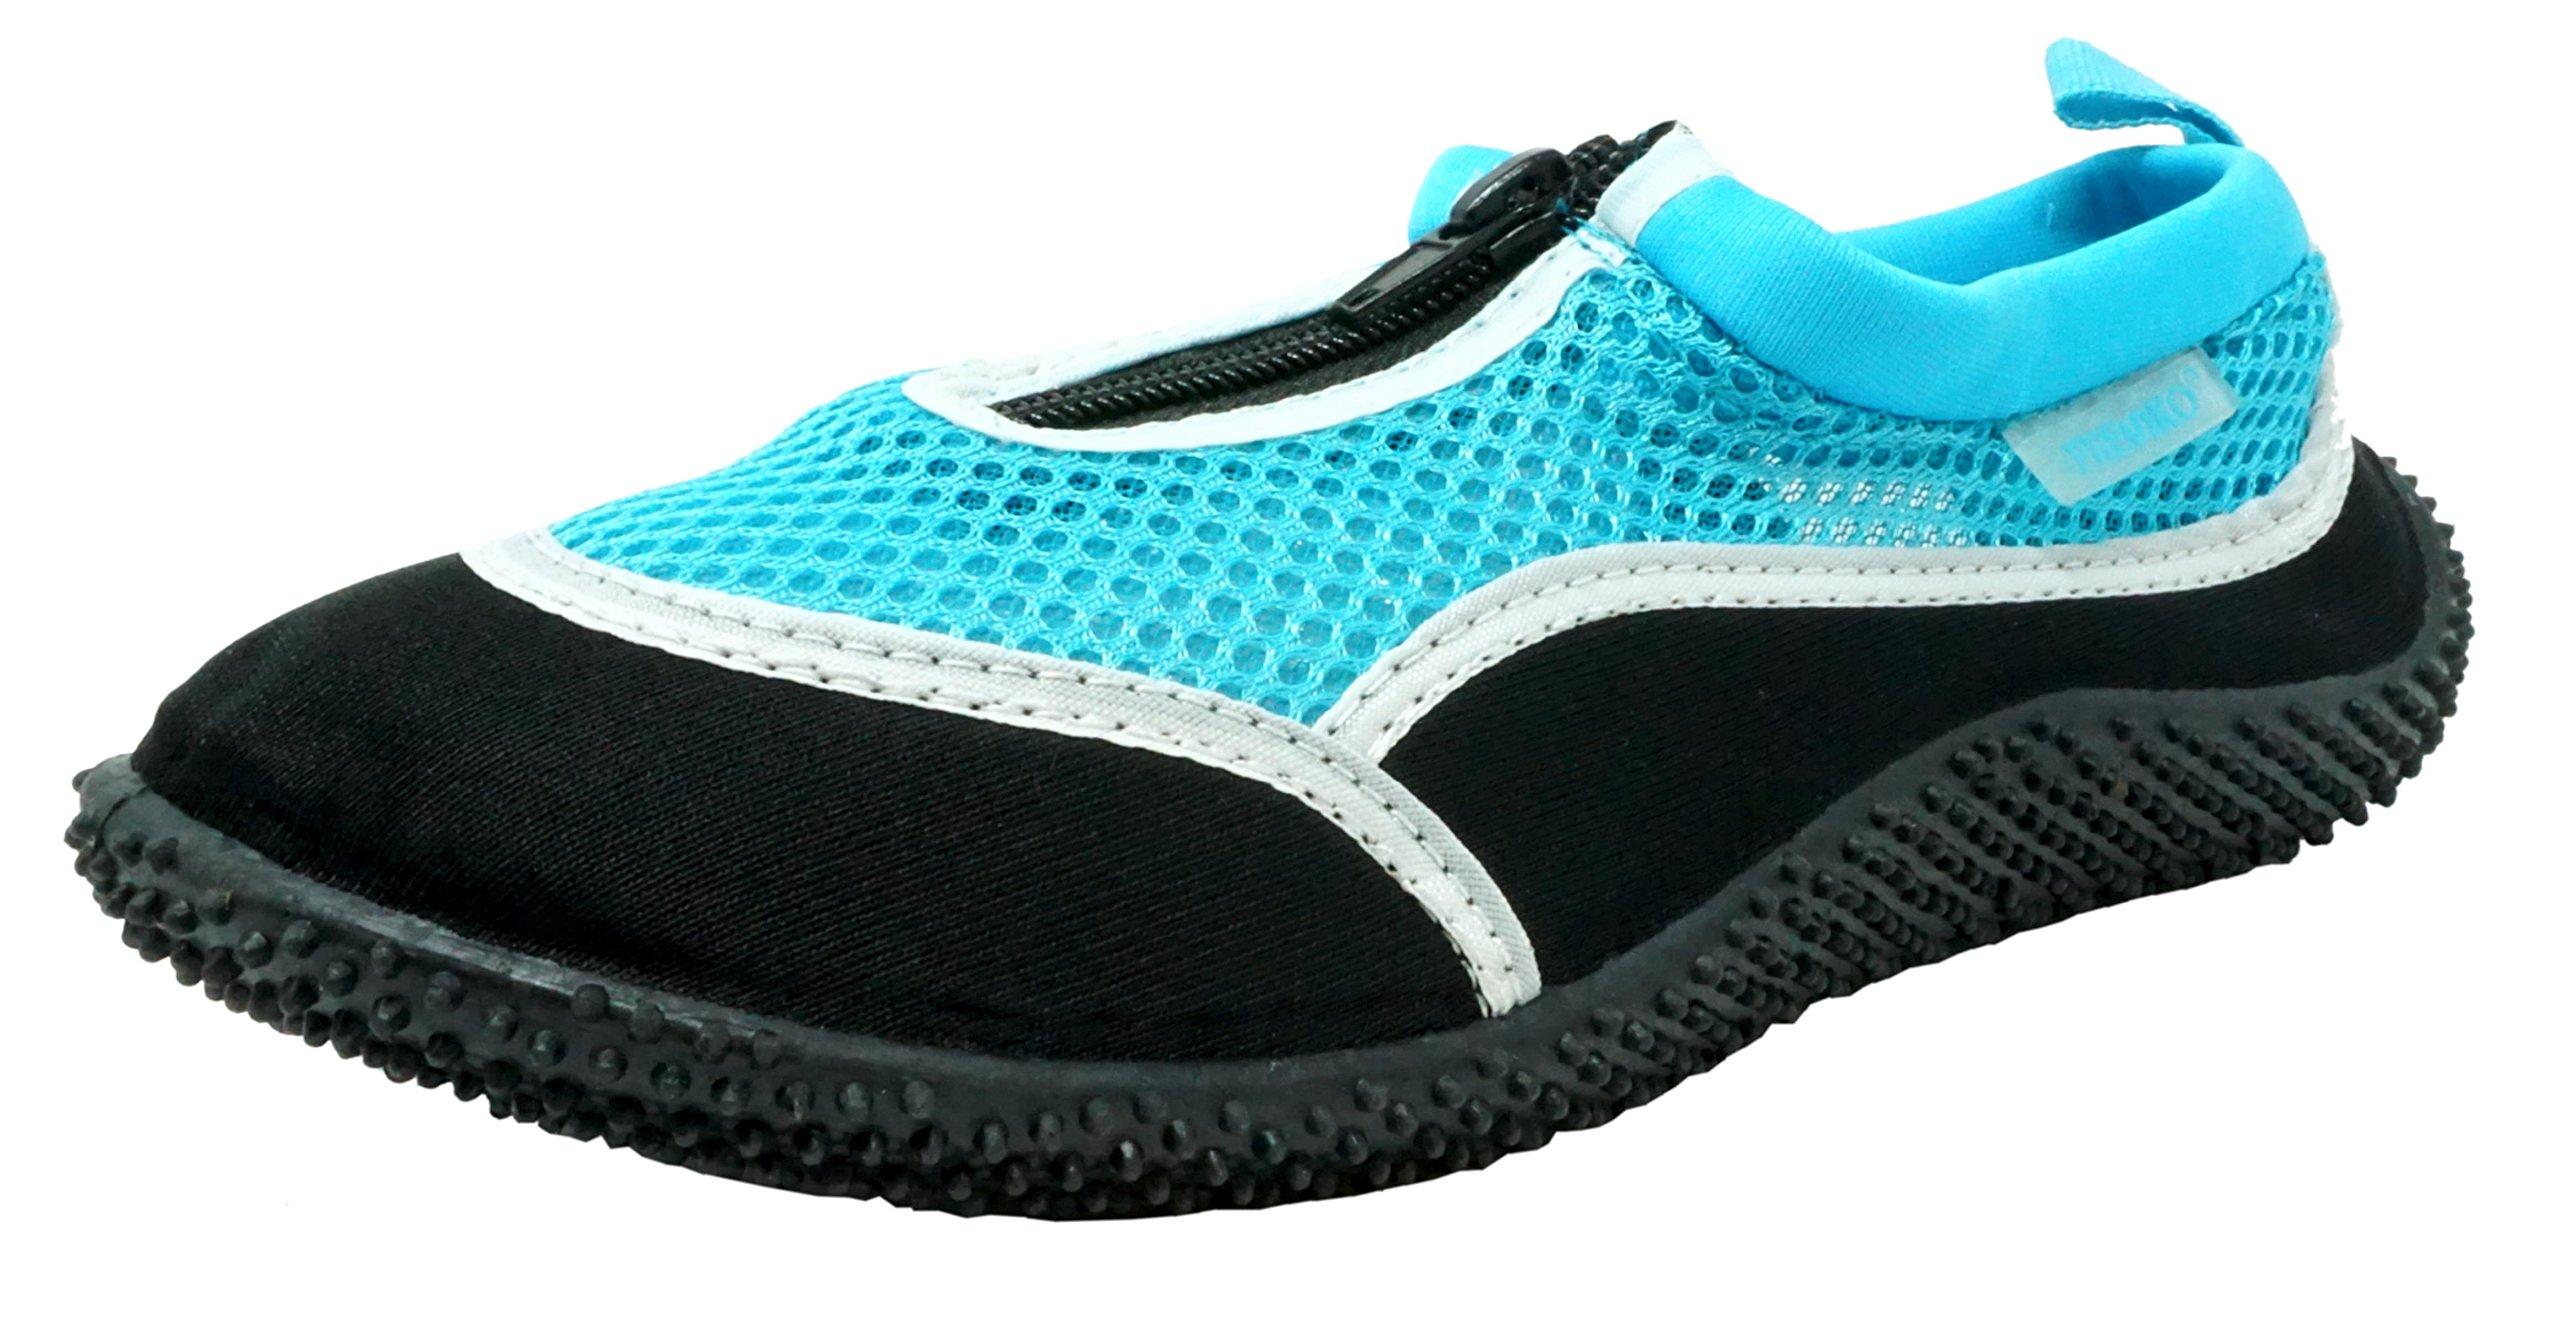 Fresko Women's Water Shoes, L1288, Black/Turquoise, 10 M US